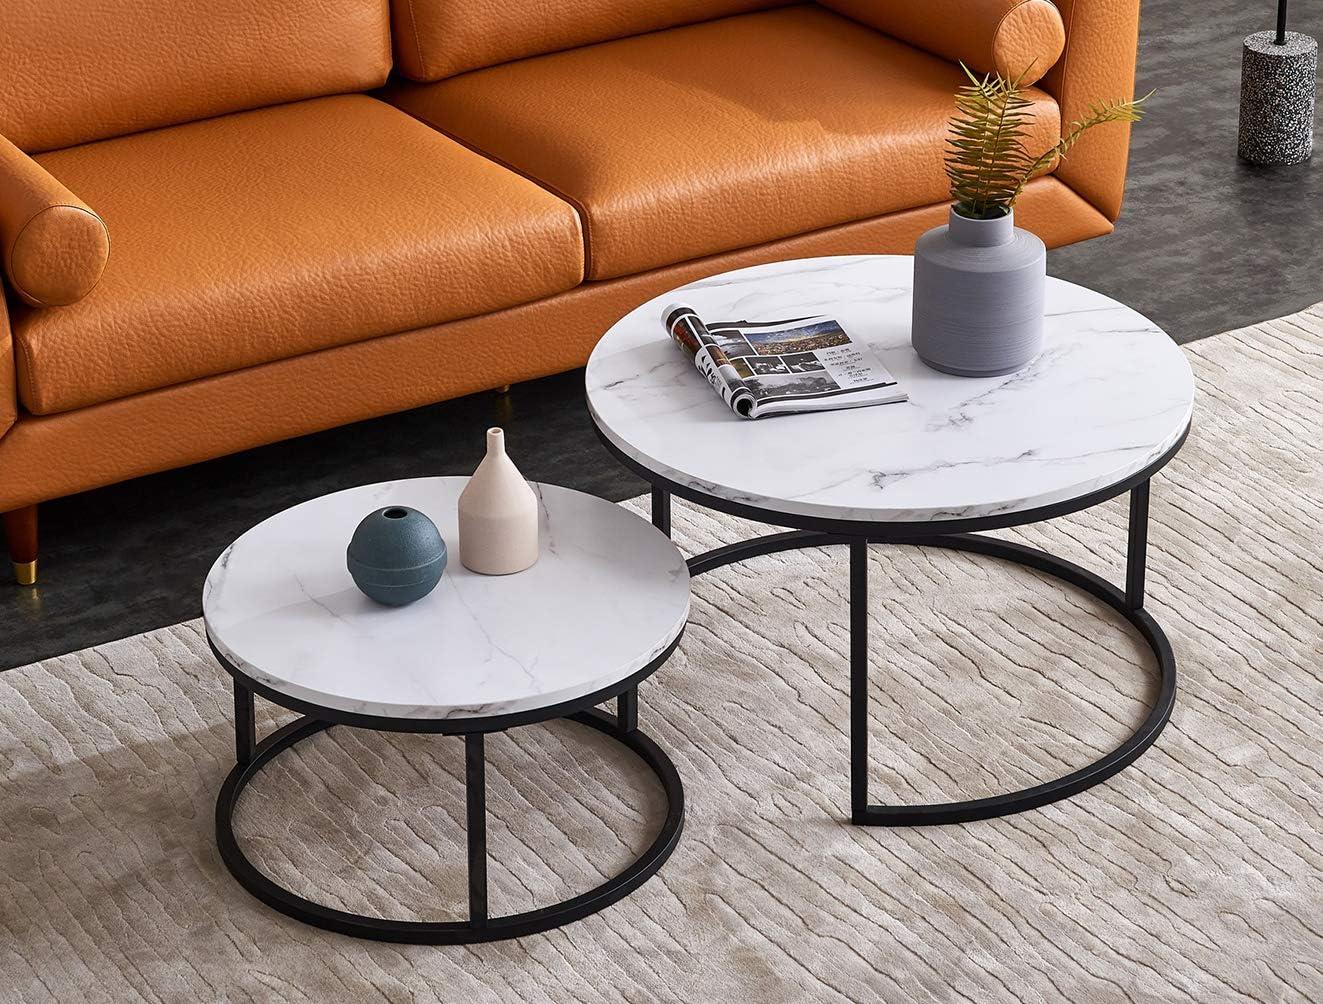 2-Piece Coffee Coffee Tables Set